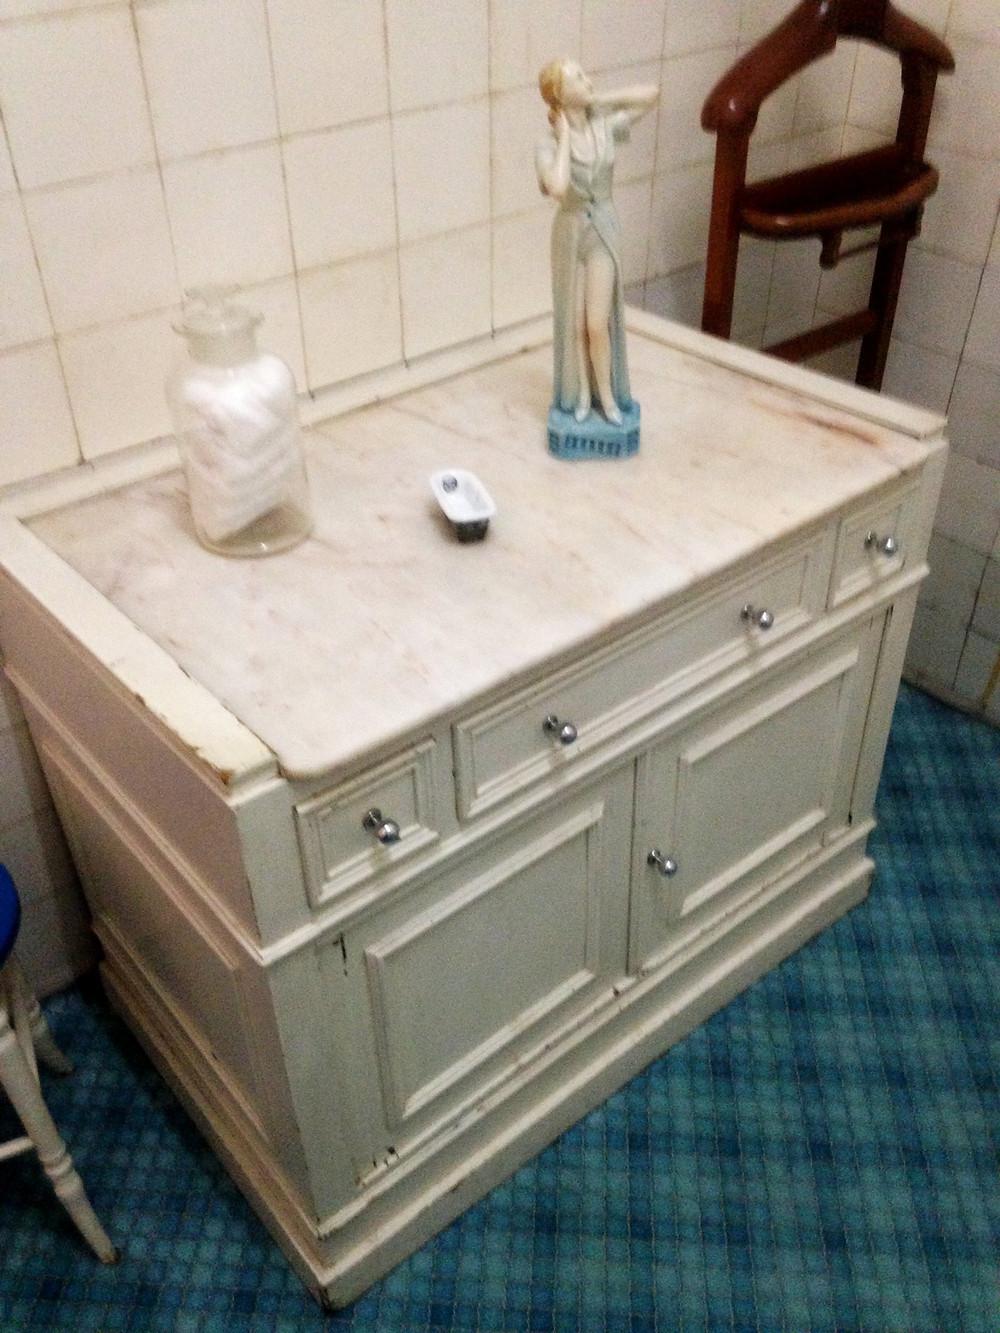 Start of the 20th century bathroom cupboard